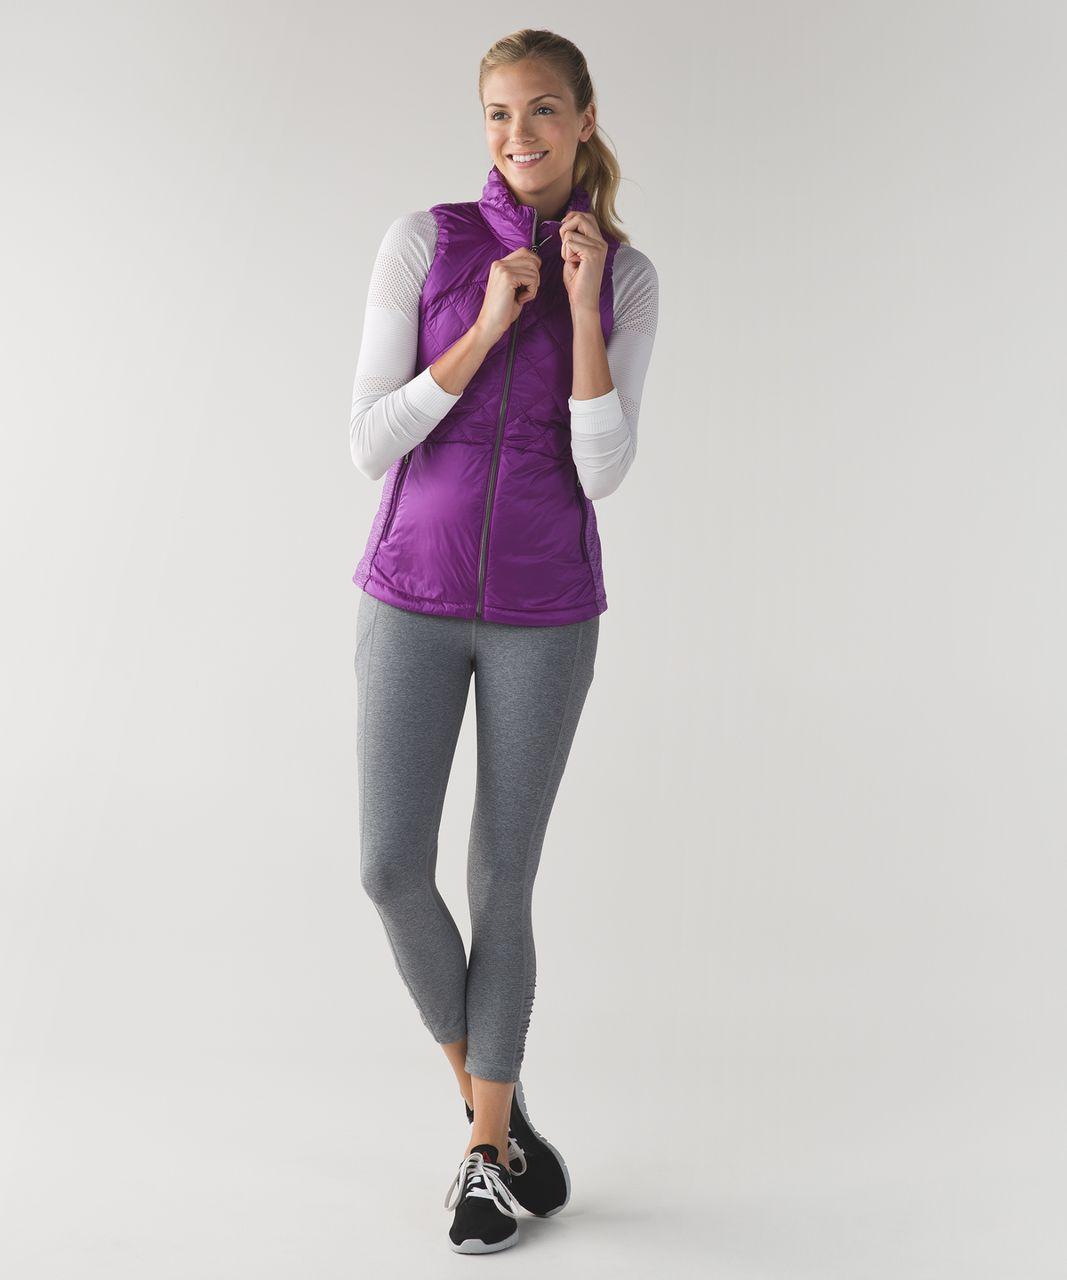 Lululemon Down For A Run Vest - Tender Violet